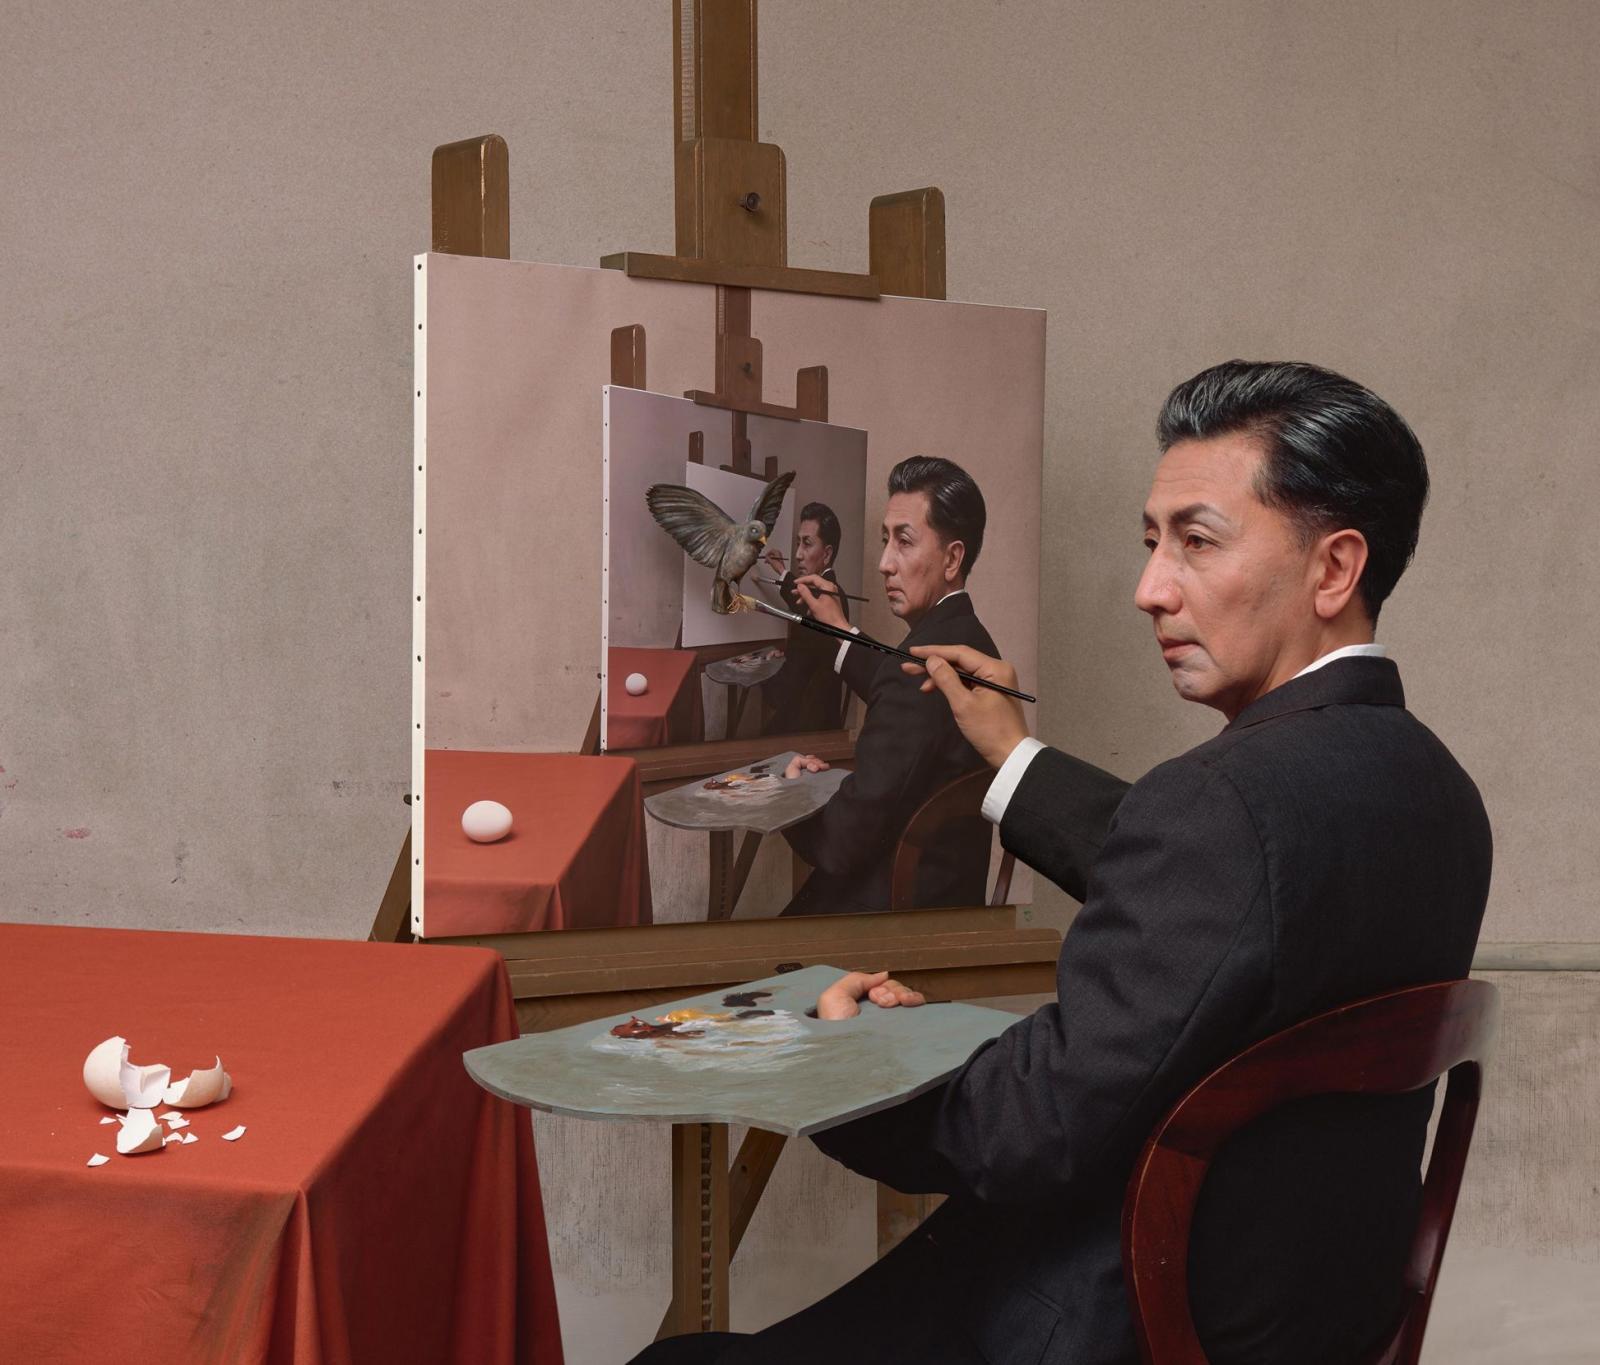 famous self portrait painting droste by yasumasa morimura